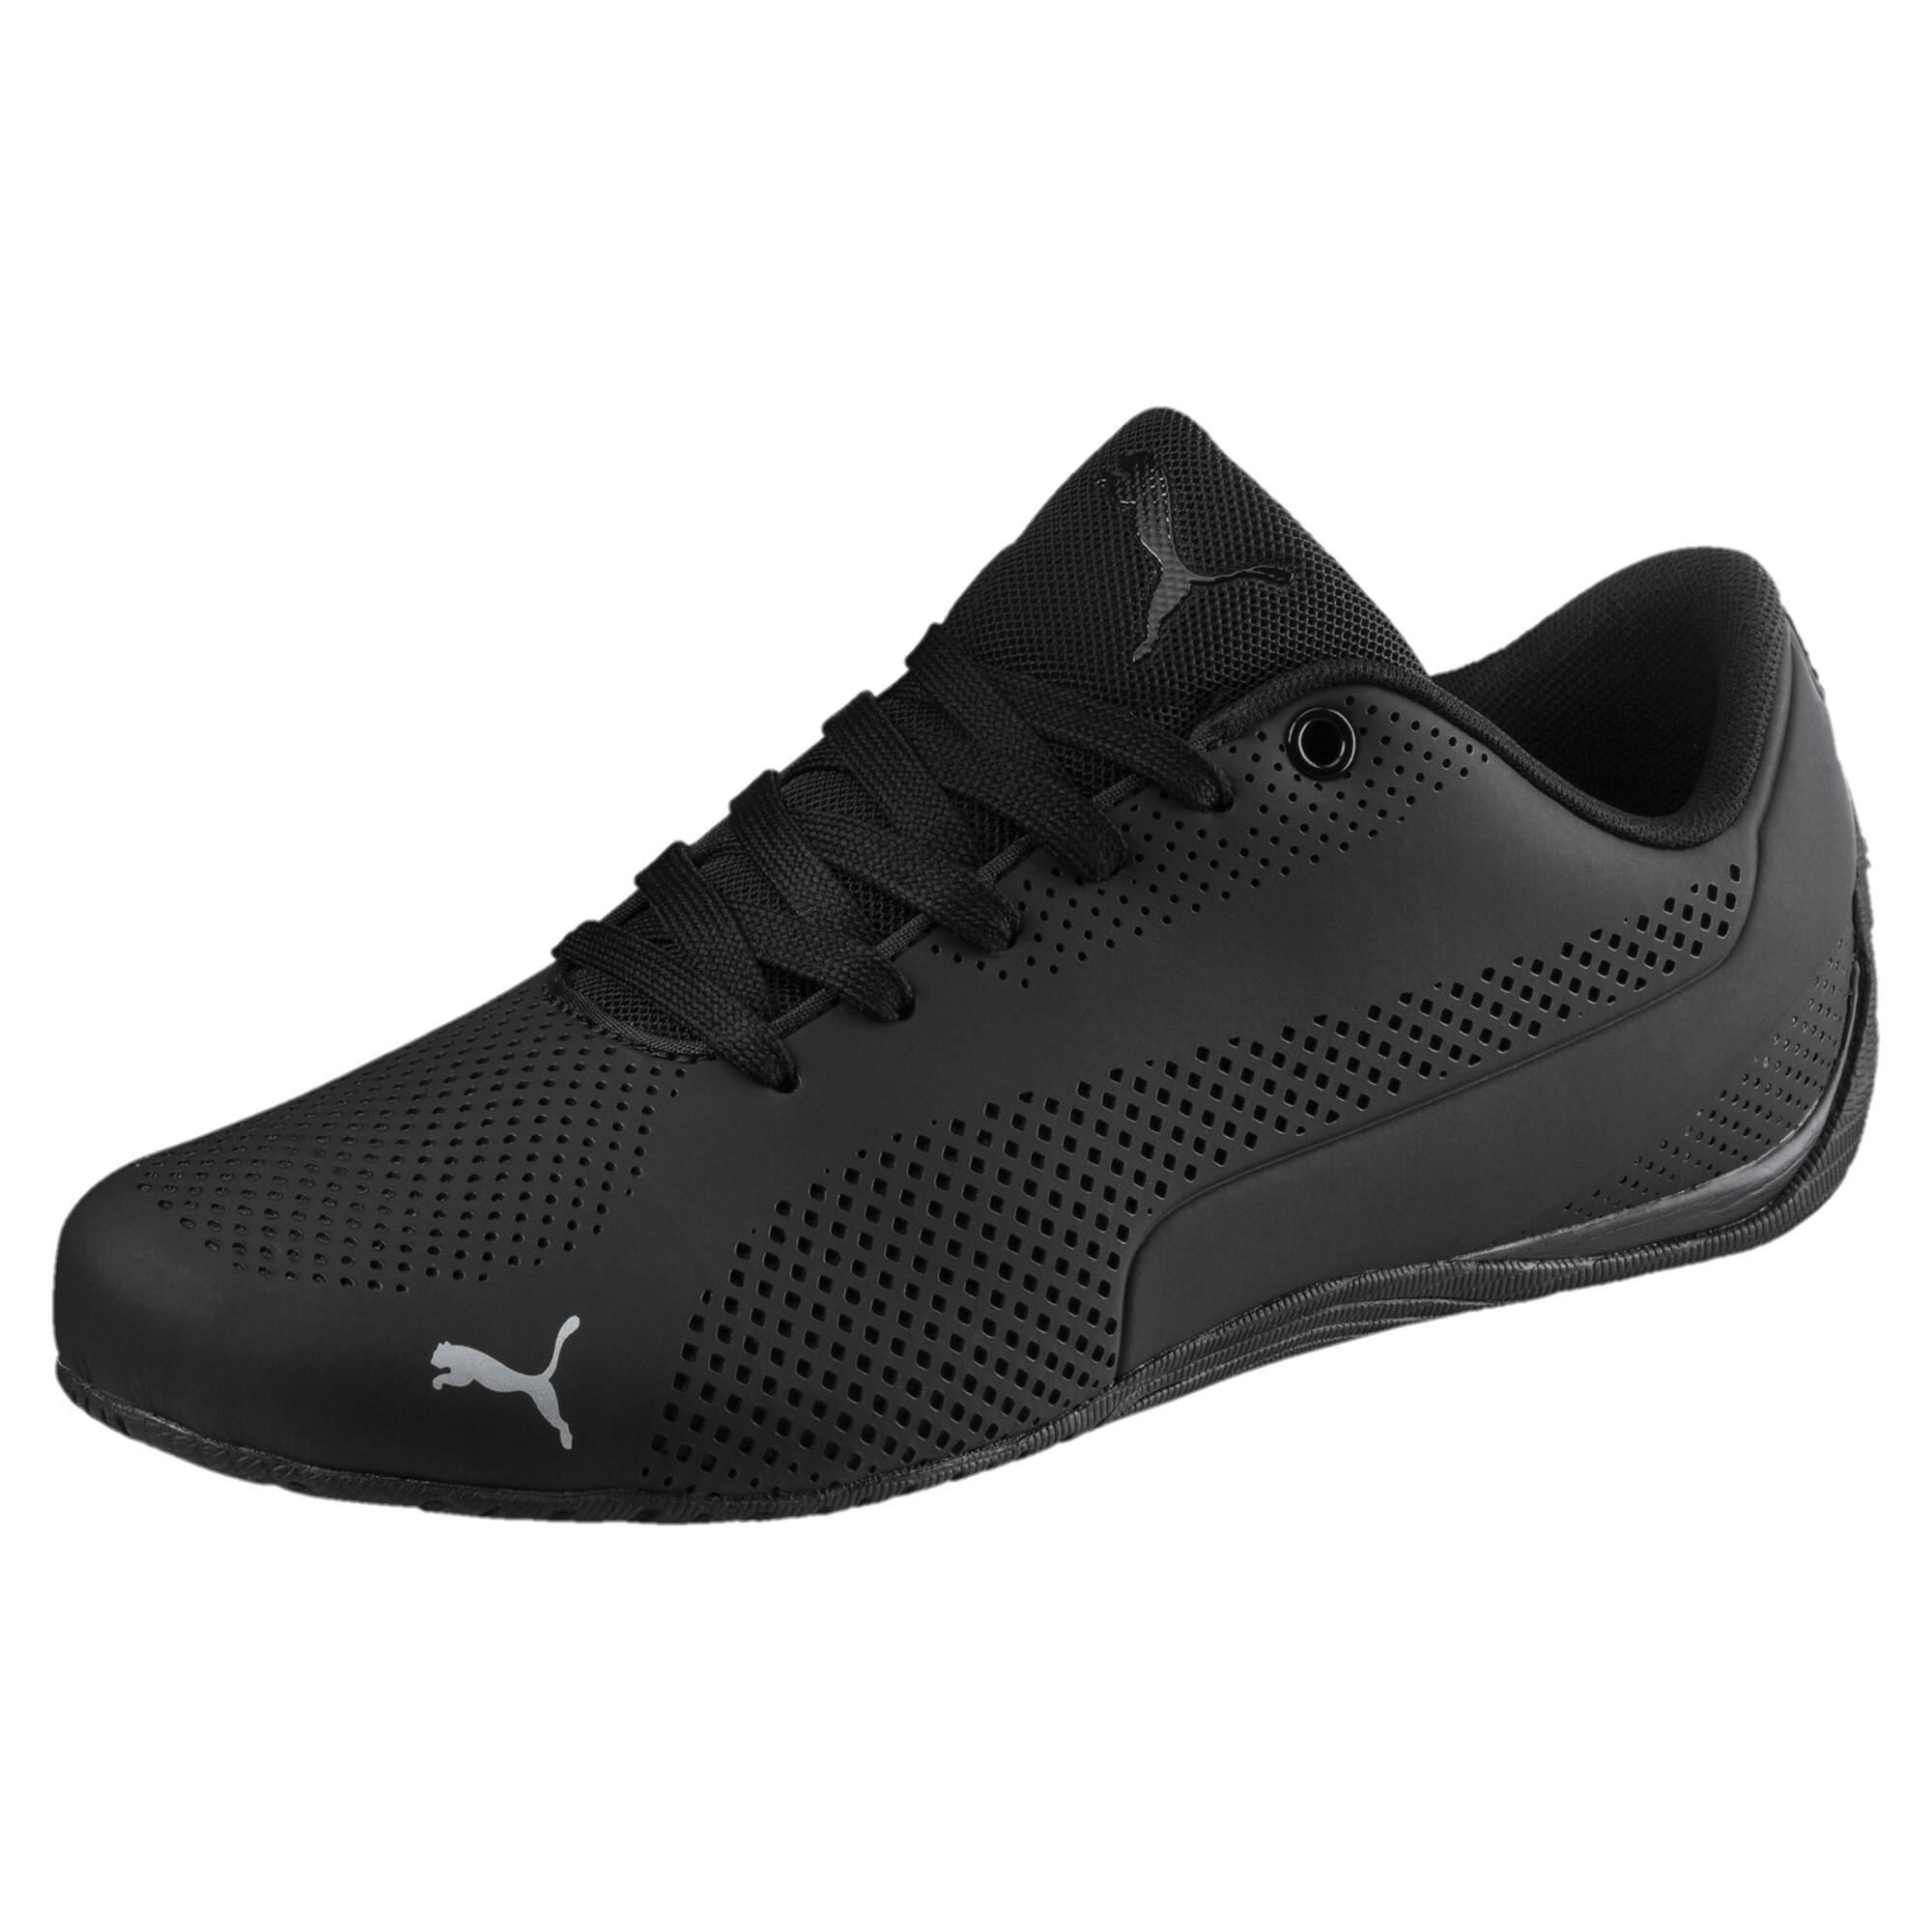 PUMA-Drift-Cat-Ultra-Reflective-Men-039-s-Shoes-Men-Shoe-Sport-Classics thumbnail 4